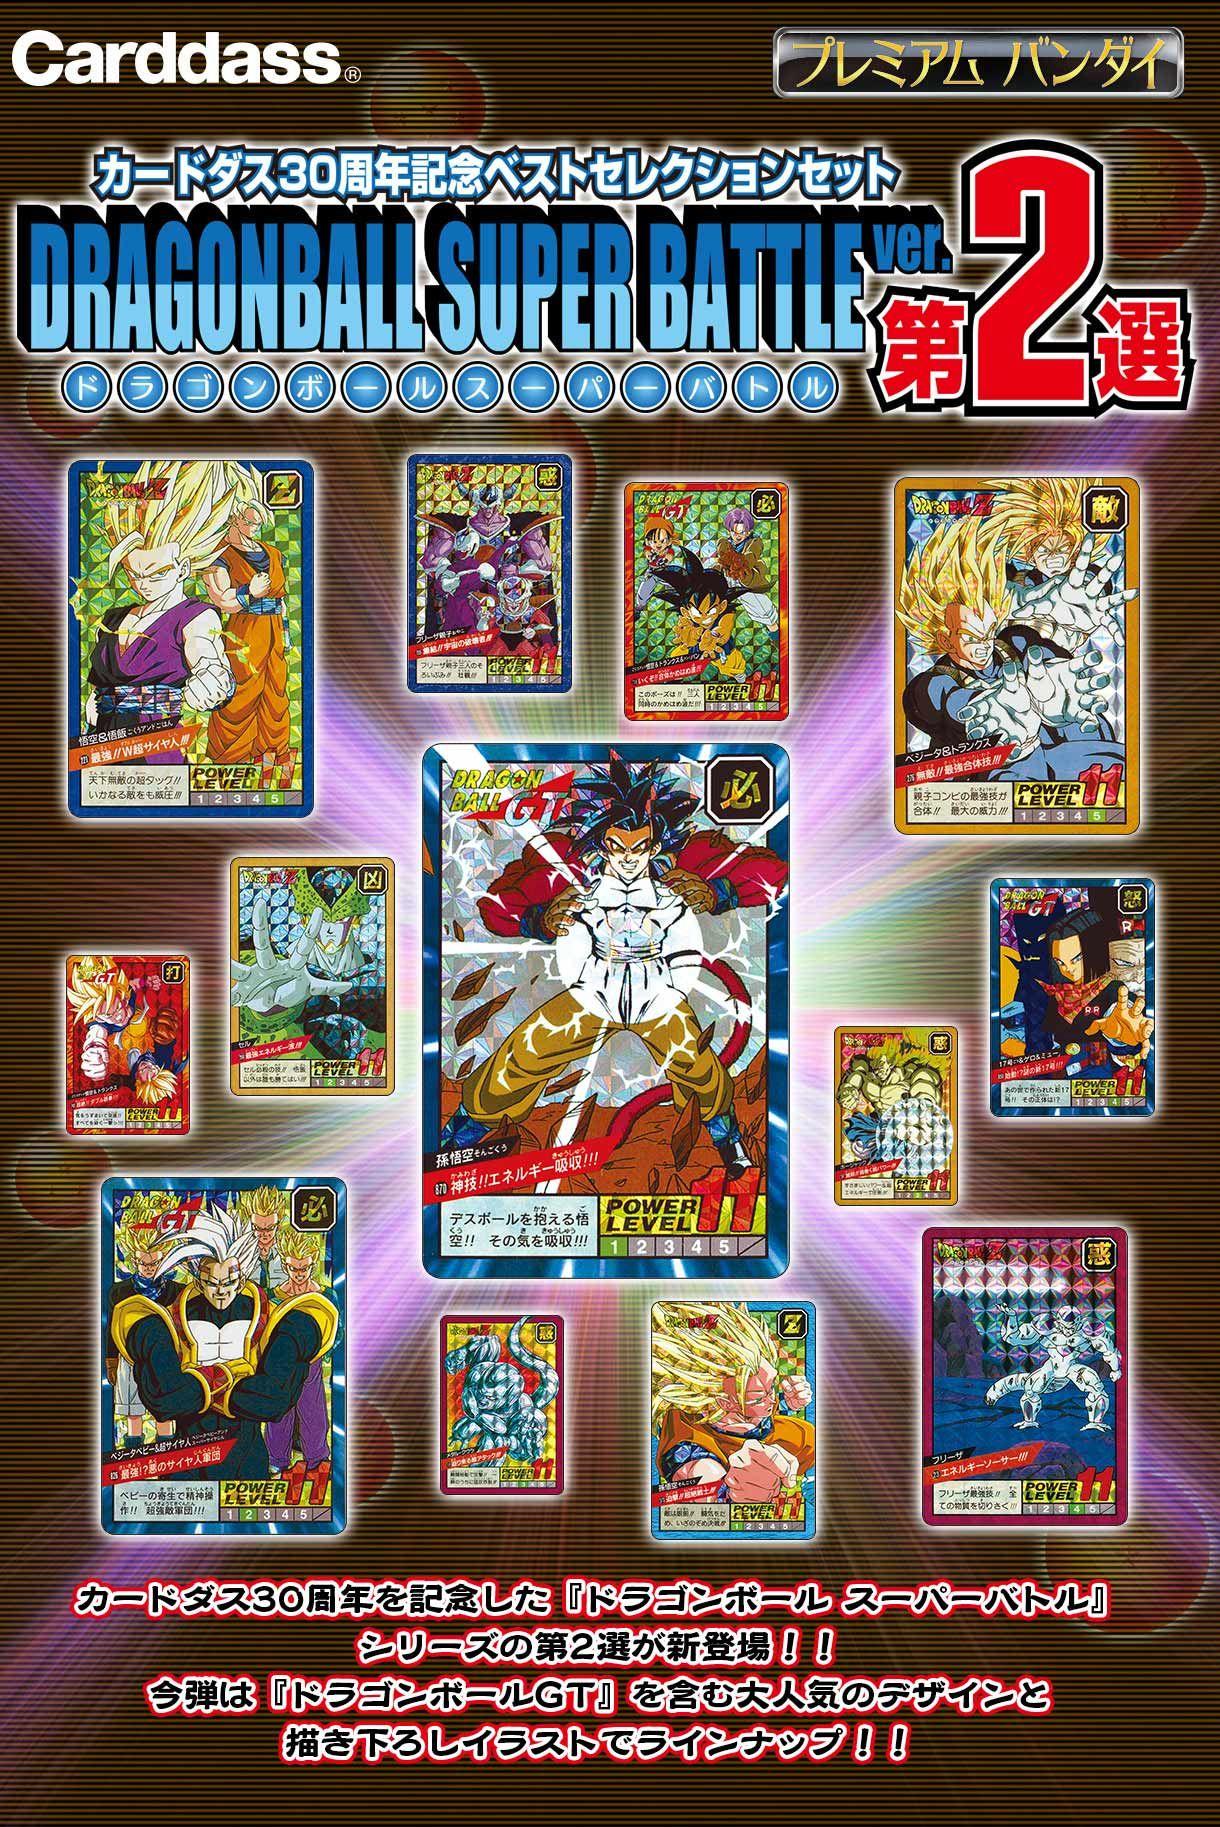 Carddass 30th Anniversary Best Selection Set Dragon Ball Super Battle ver 2